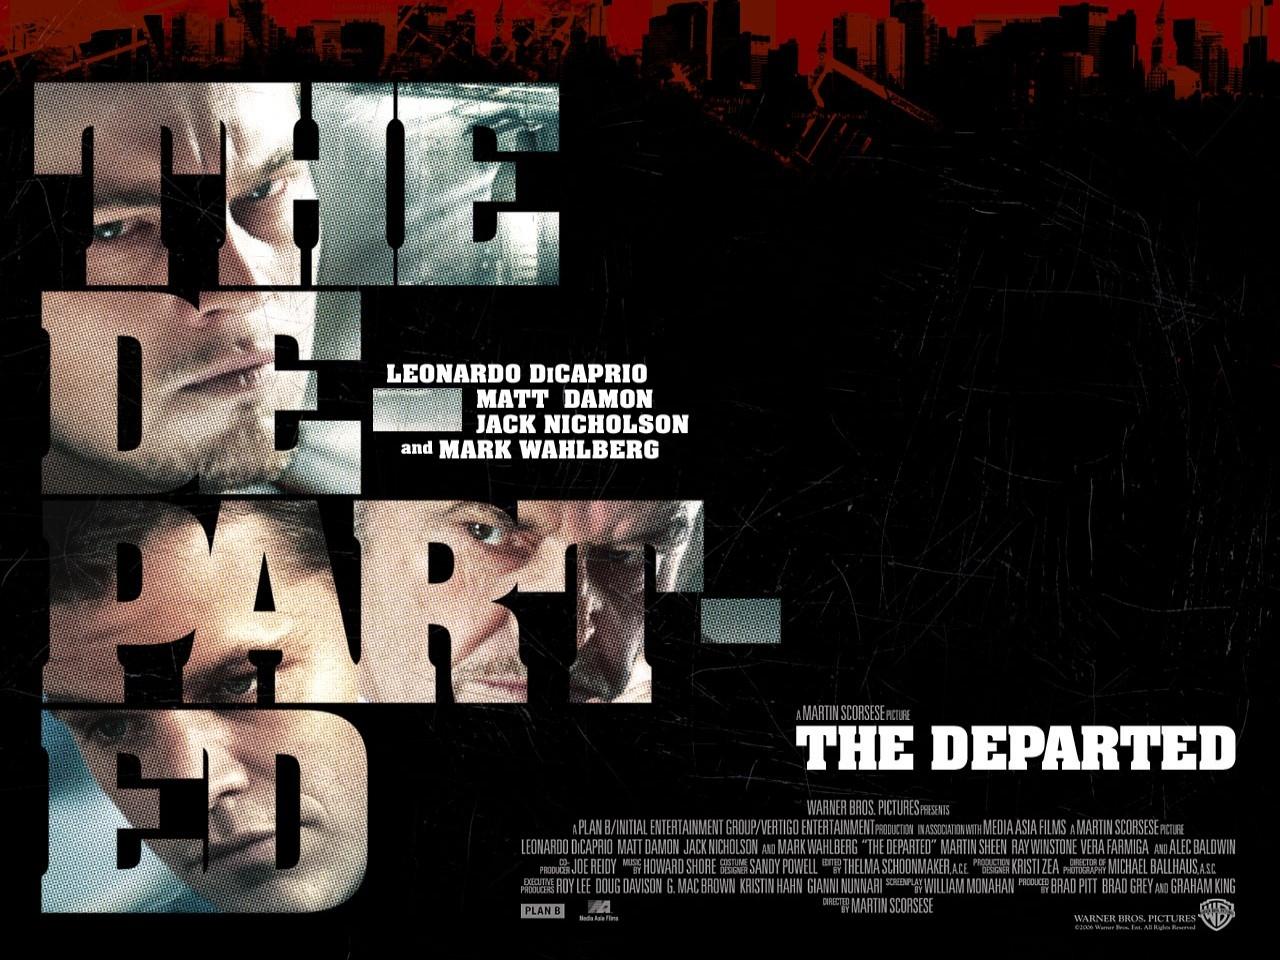 Wallpaper del film The Departed